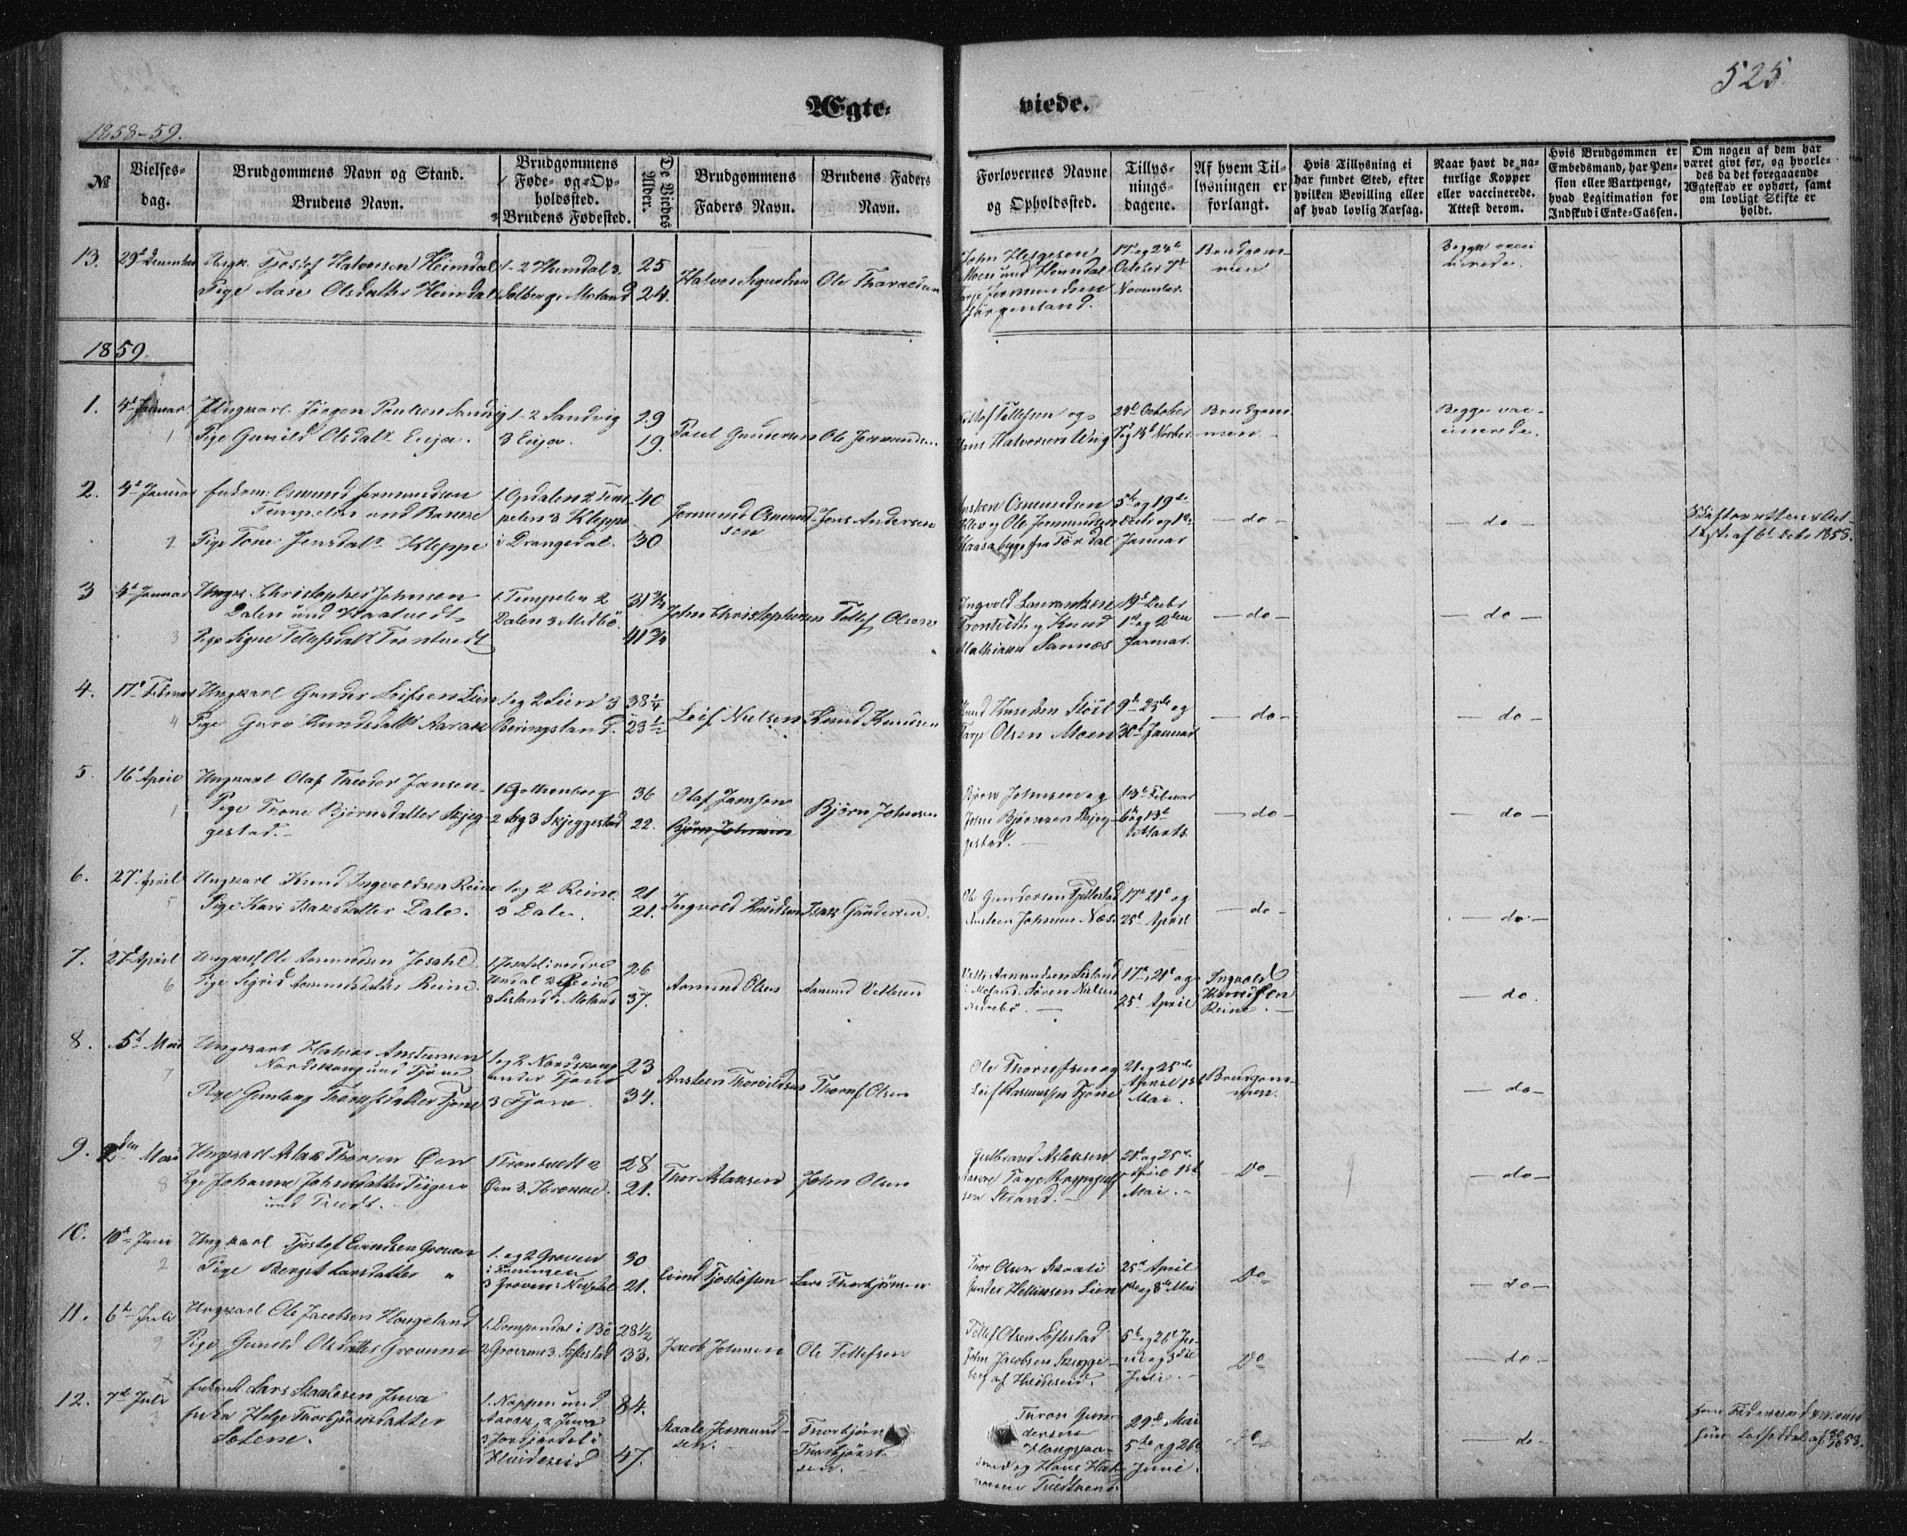 SAKO, Nissedal kirkebøker, F/Fa/L0003: Ministerialbok nr. I 3, 1846-1870, s. 524-525